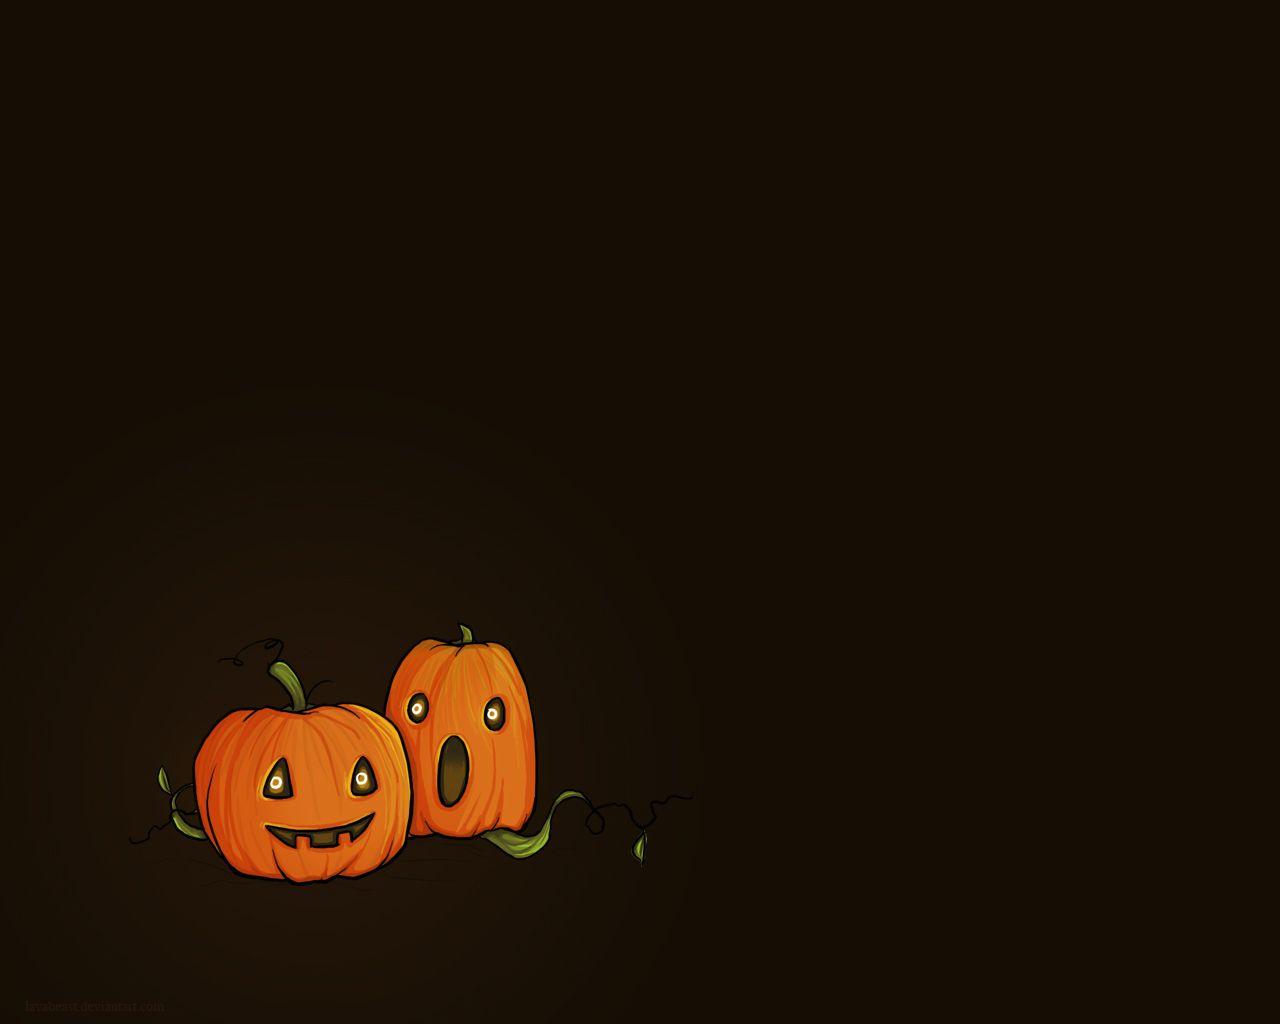 Cute Halloween Desktop Backgrounds Images Pictures   Becuo 1280x1024